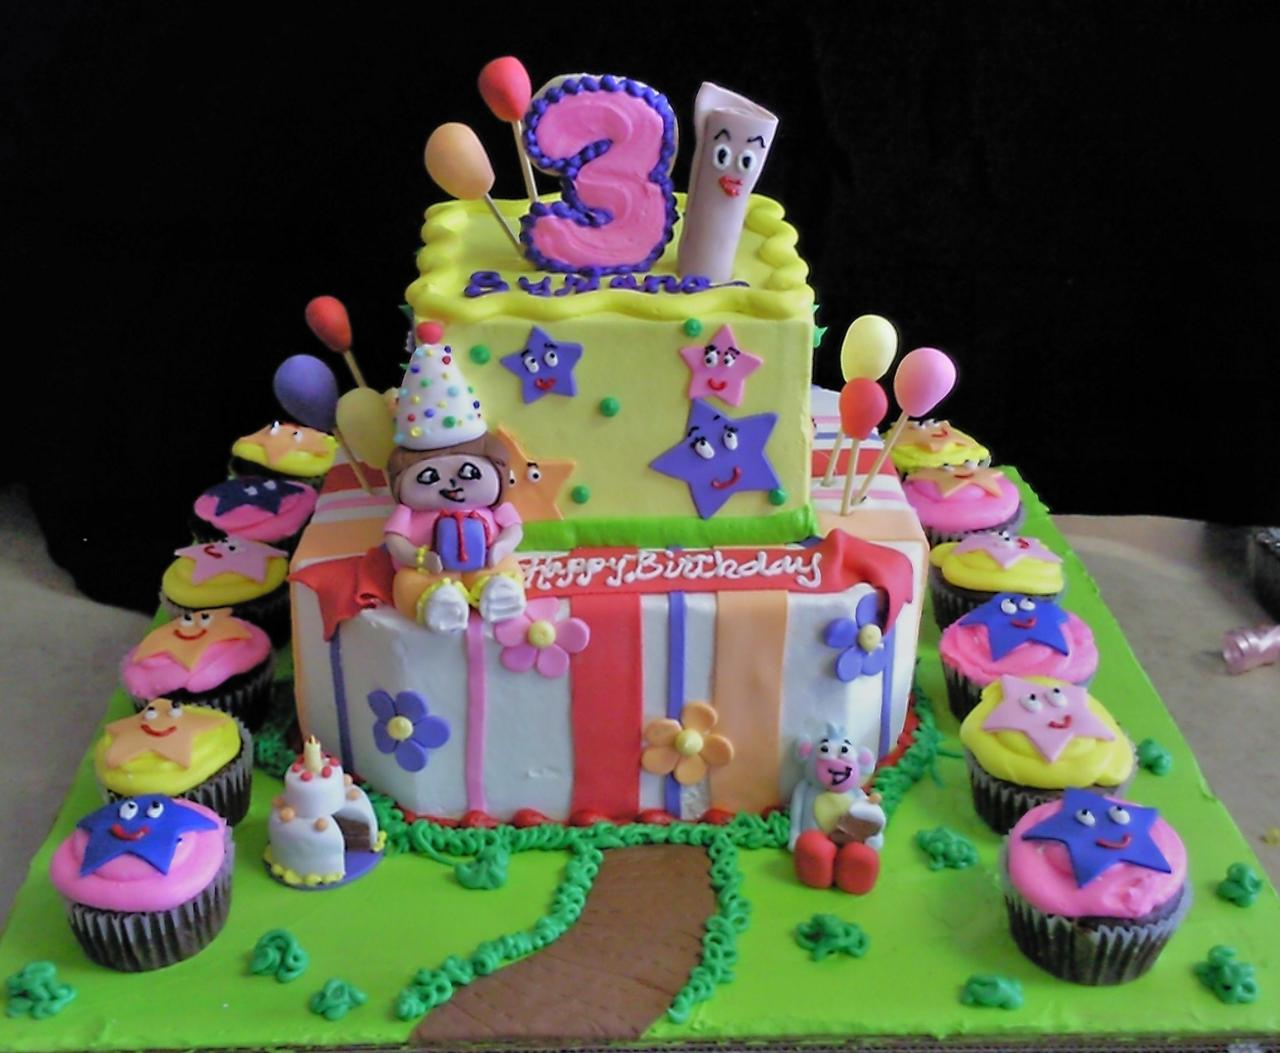 Dora the Explorer Birthday Cake Decorations